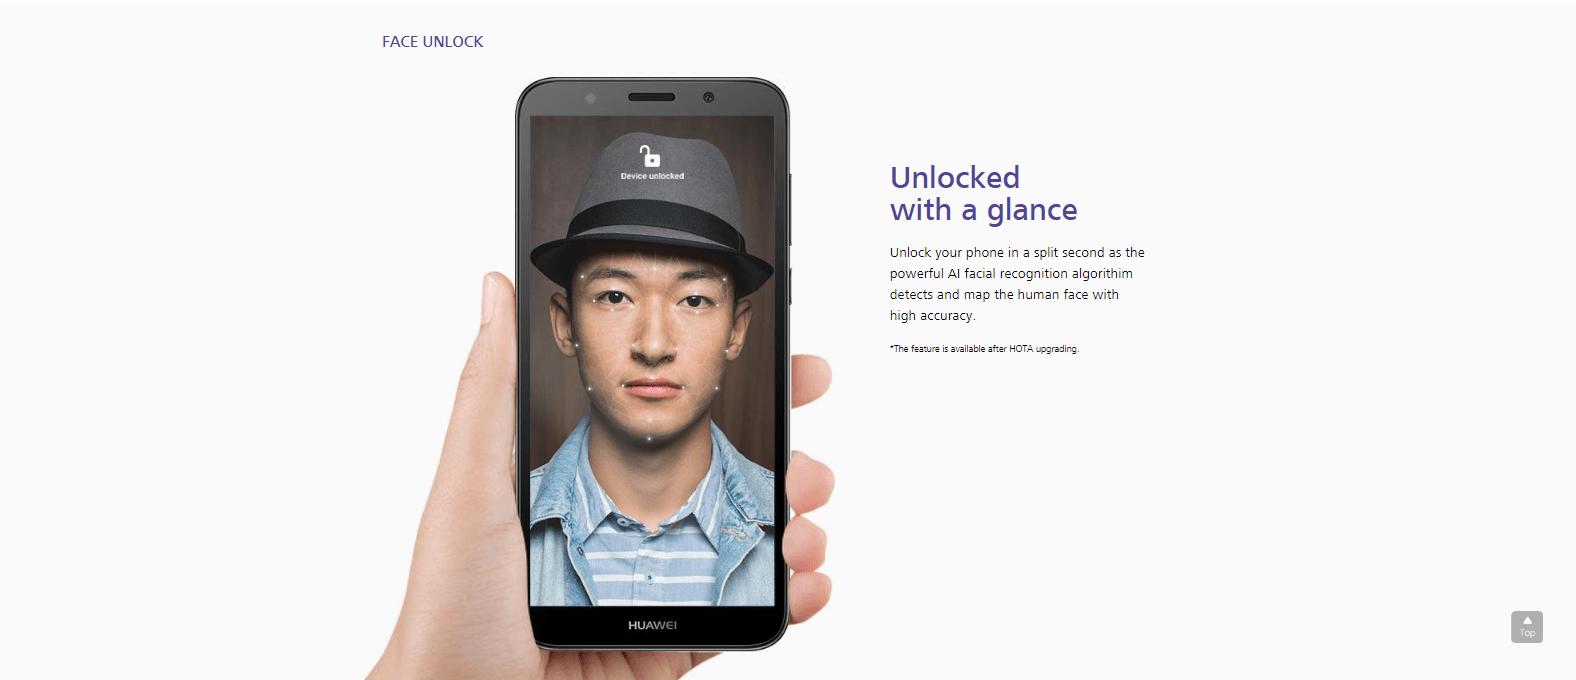 HUAWEI Y5 Prime 2018 - 2GB RAM - 16GB - Black